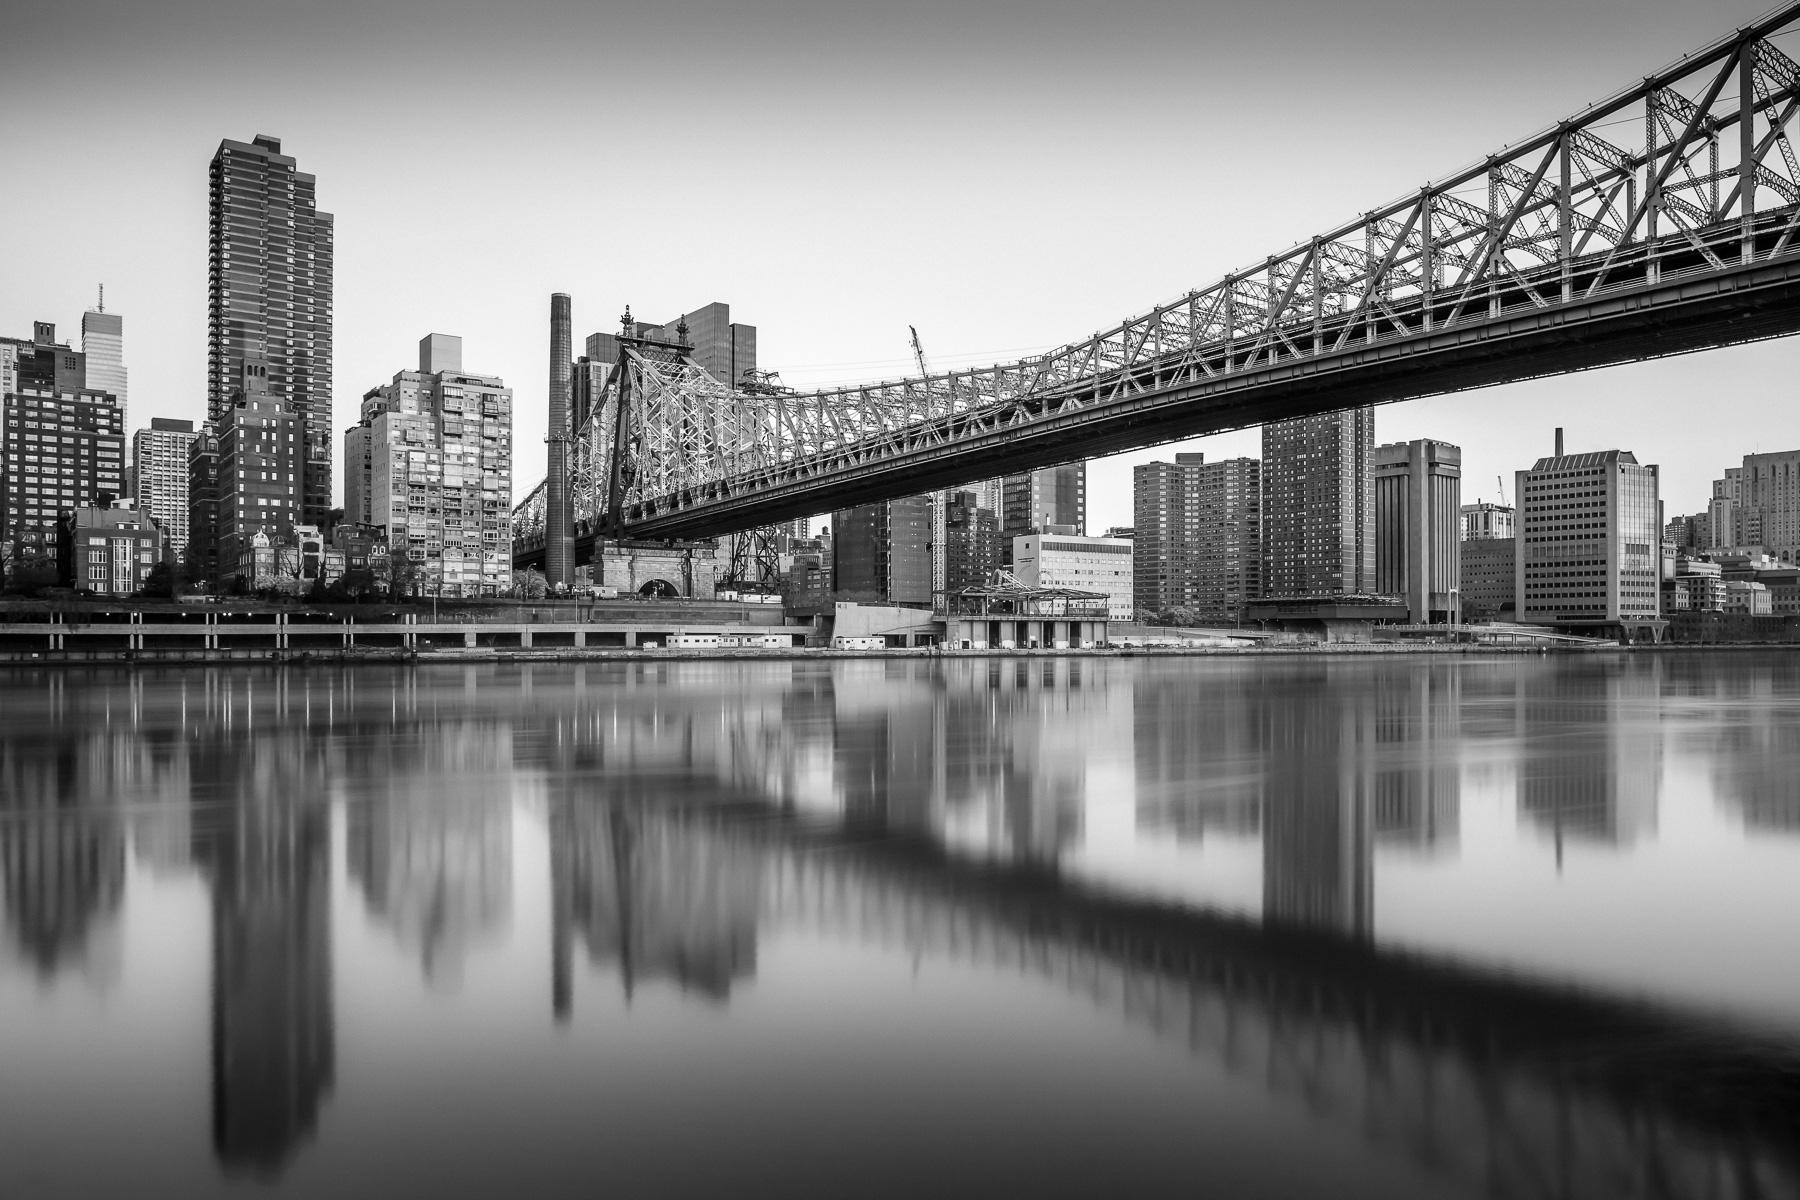 queensboro bridge black and white reflections